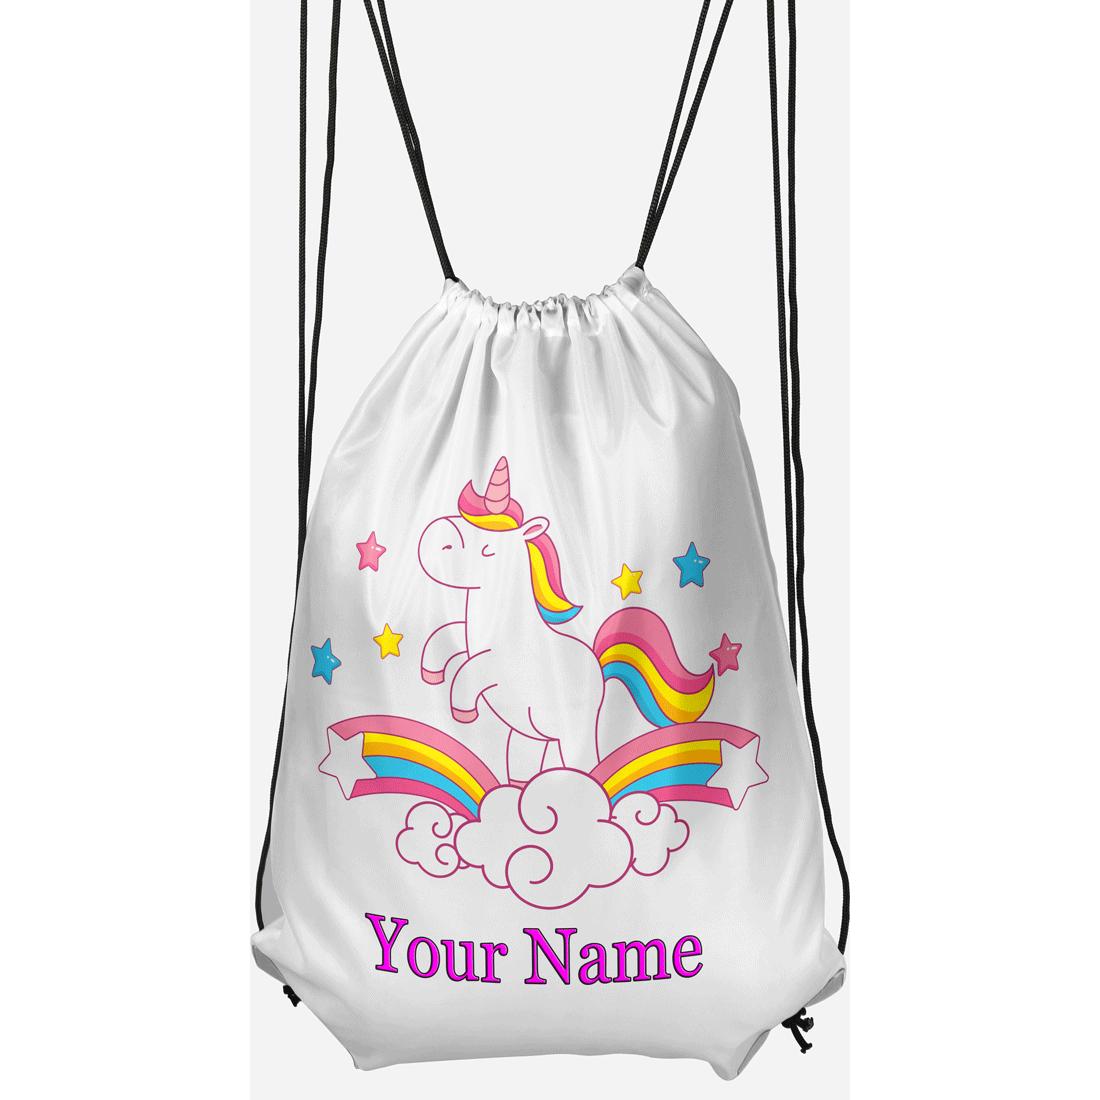 Customised Dancing Unicorn Drawstring Gym Bag